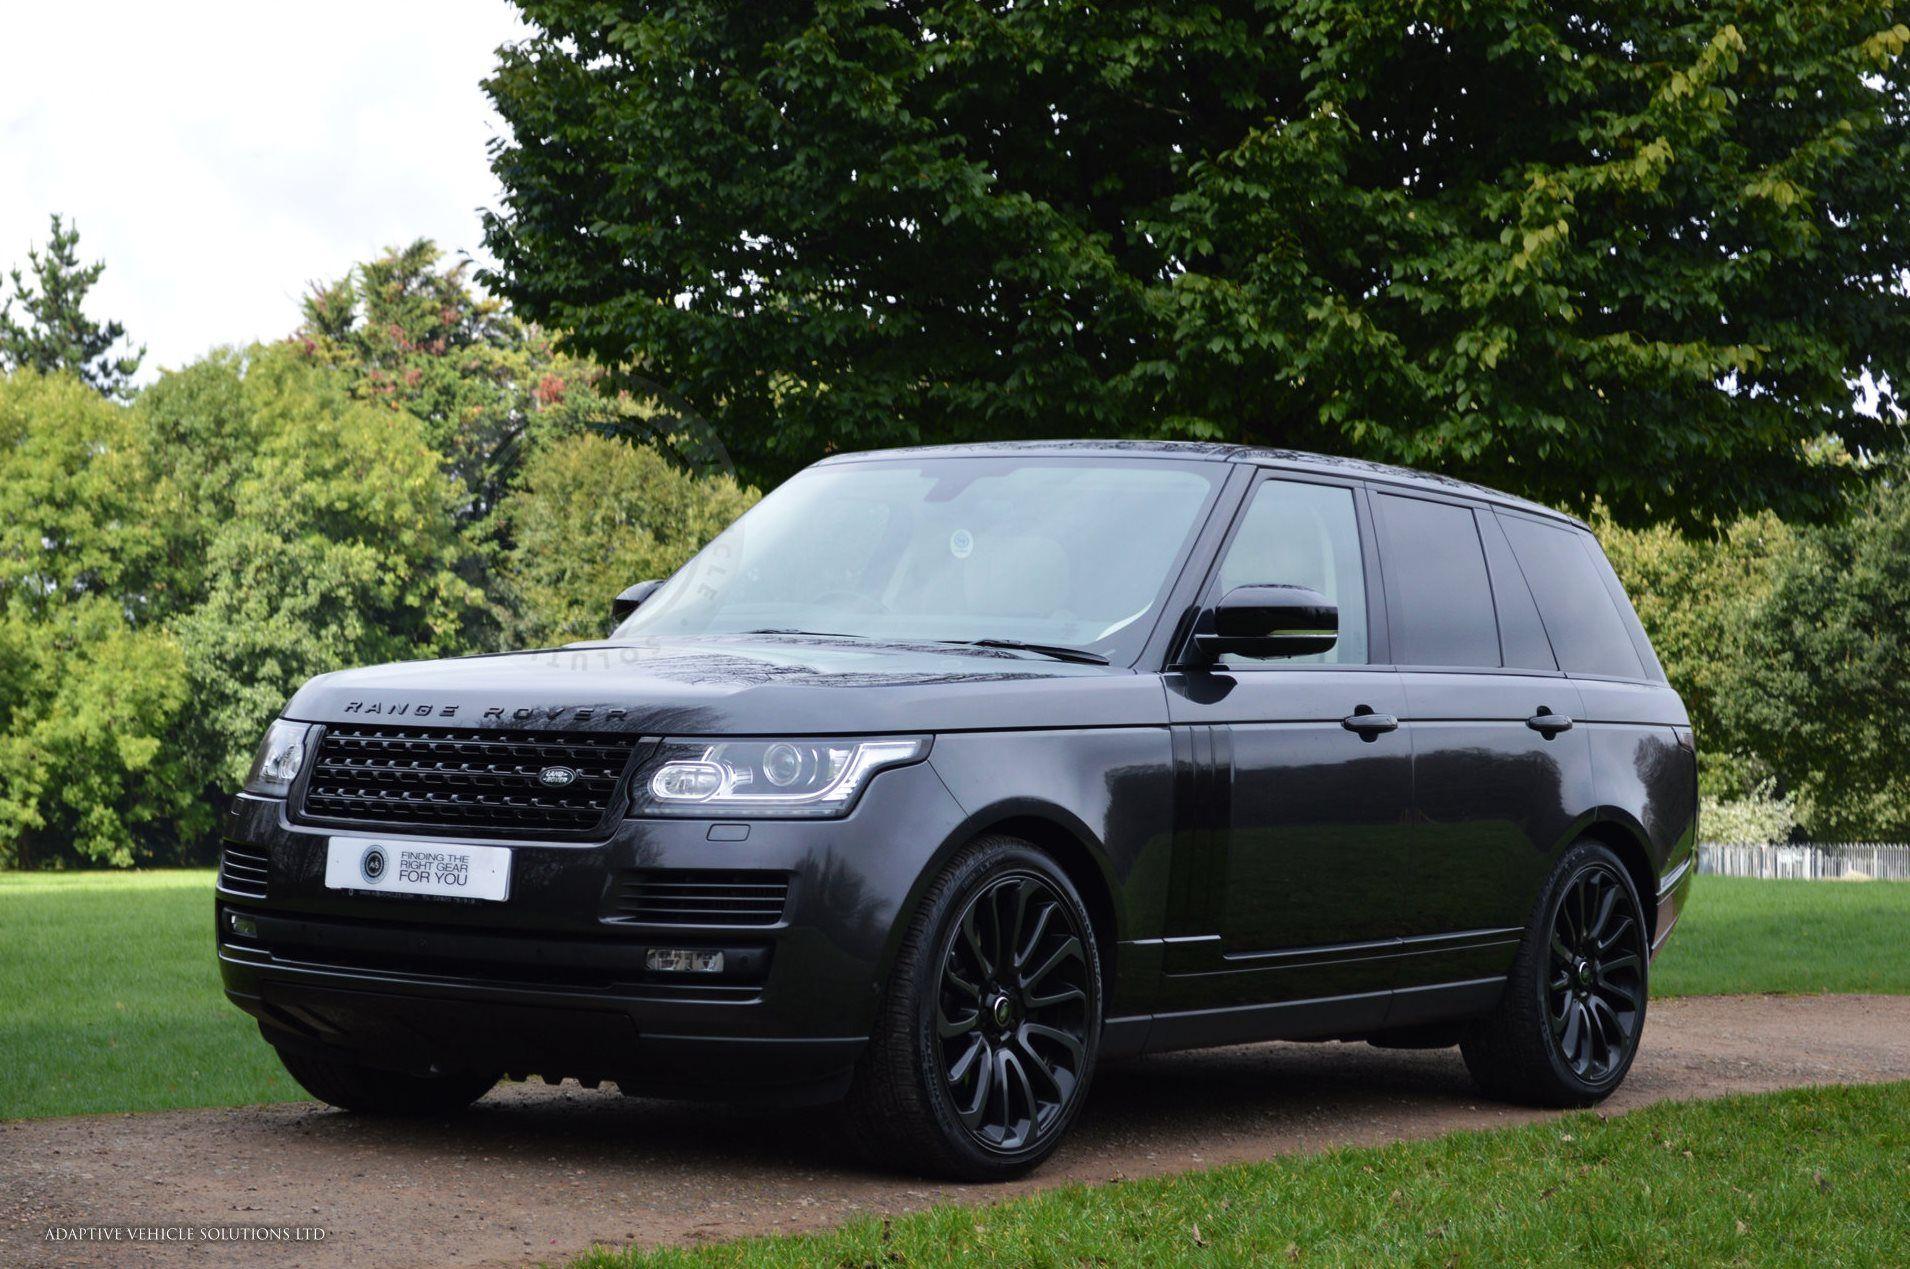 Range Rover Autobiography Petrol Range Rover Range Rover for